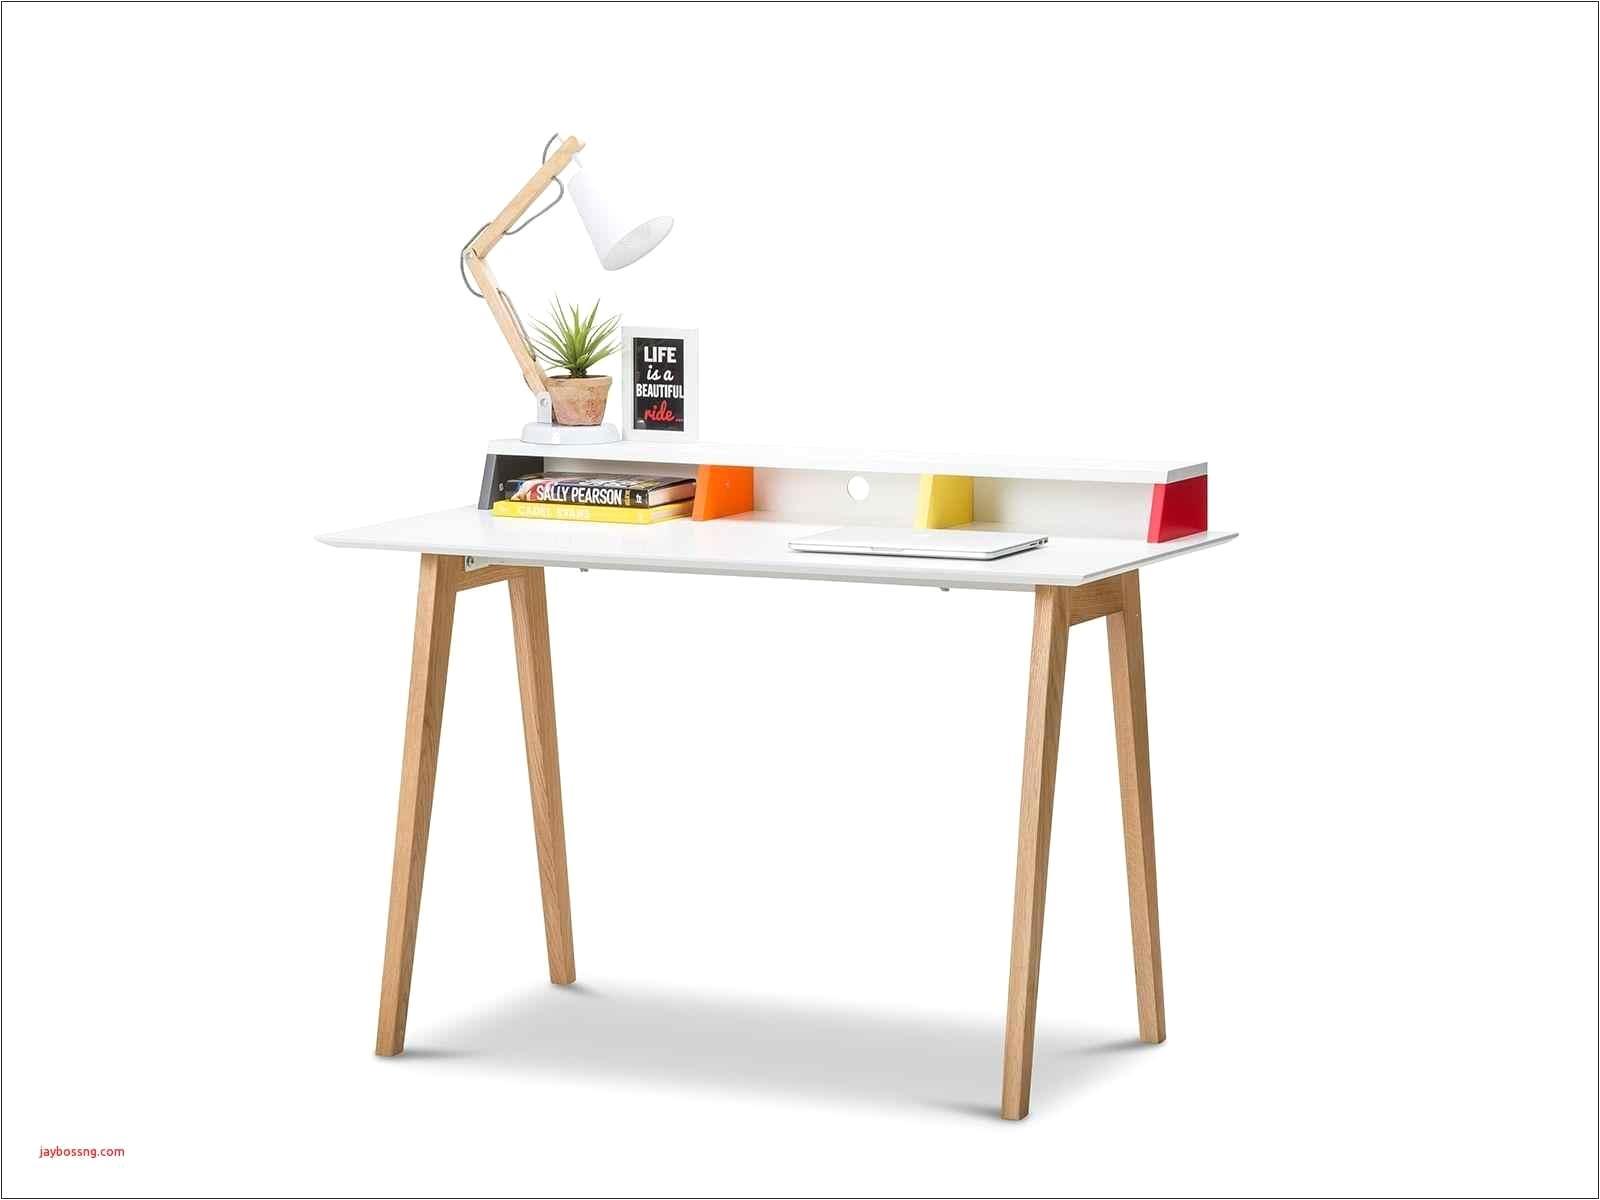 diy drafting table elegant 40 drafting table puter desk